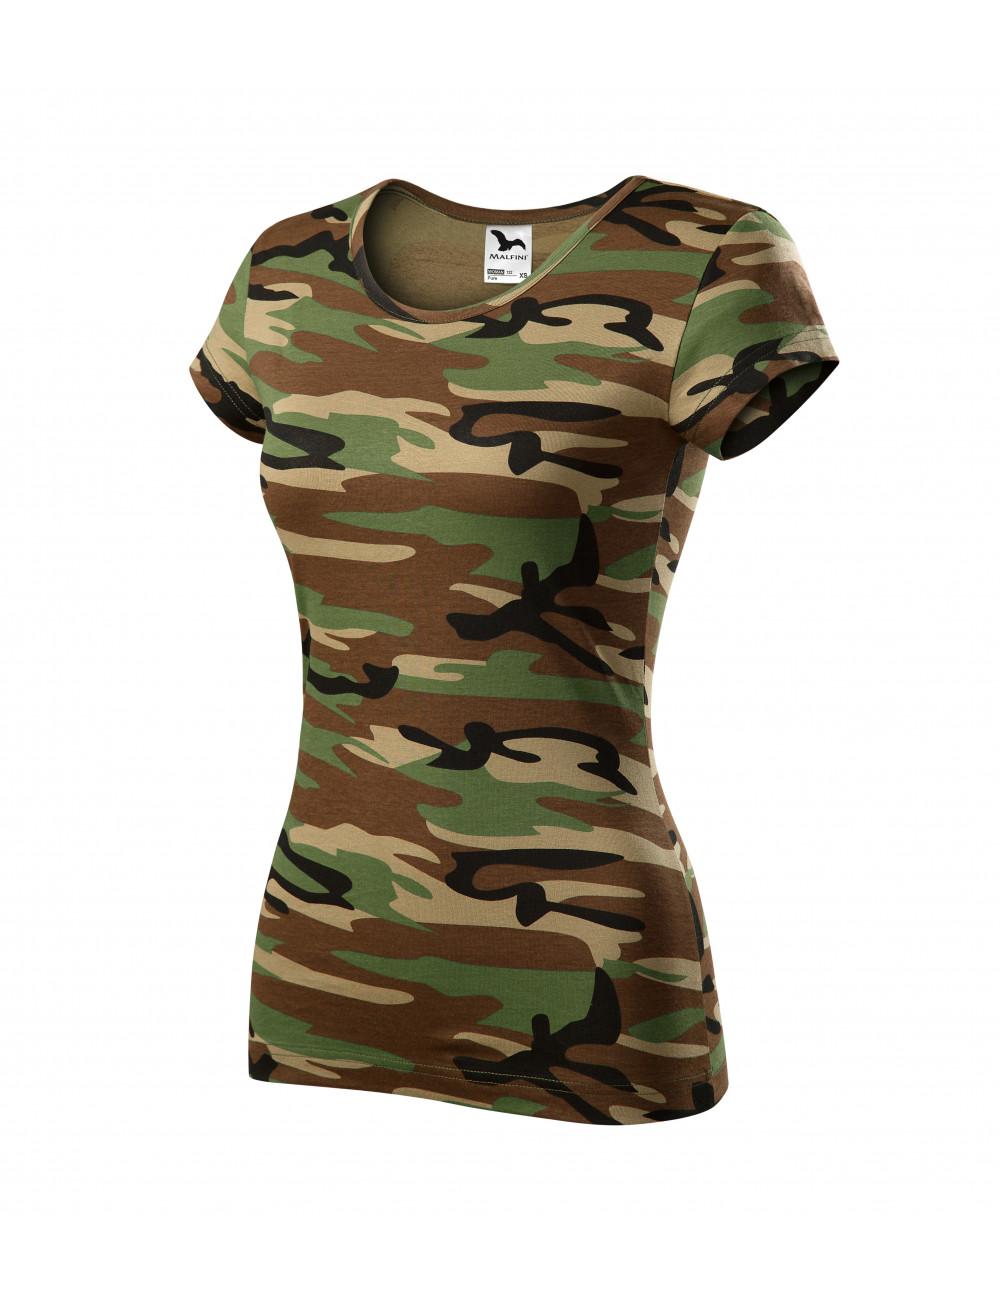 Adler MALFINI Koszulka damska Camo Pure C22 camouflage brown